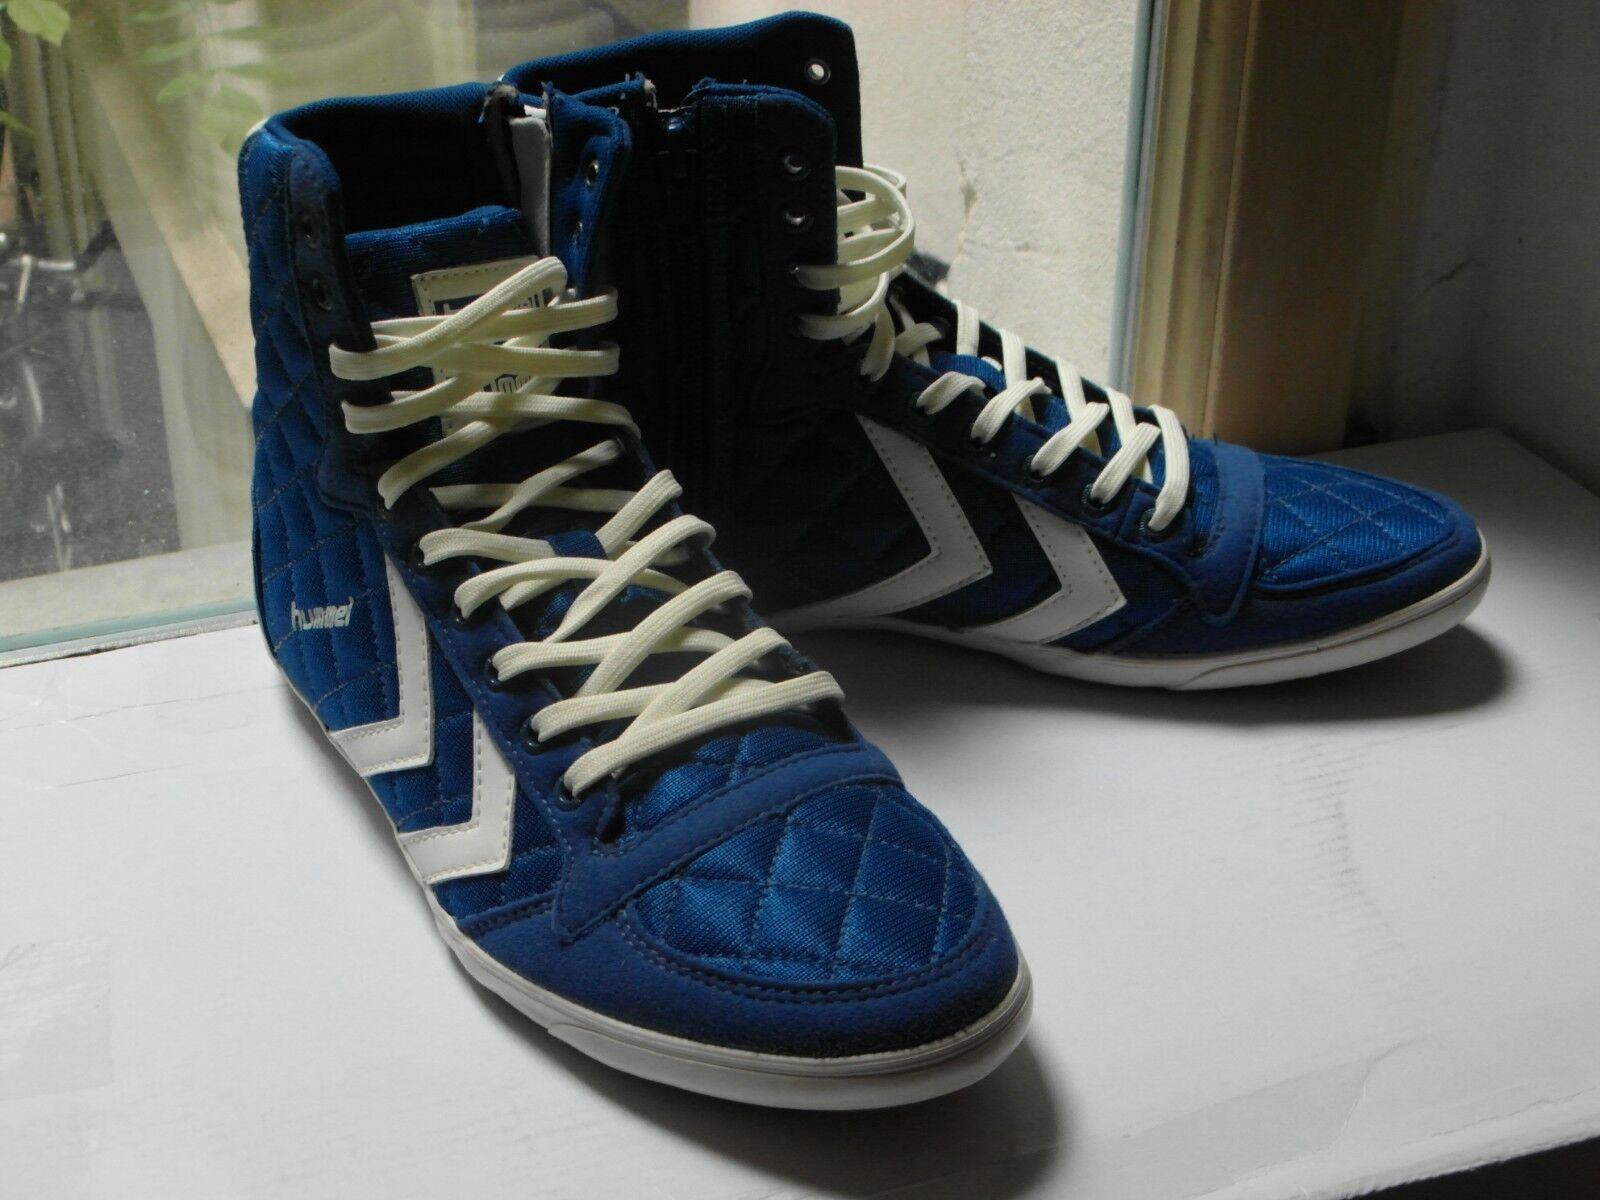 HUMMEL Miss Stadil 39 Quilted High Damen Sneakers Blau-Weiß 39 Stadil e9d625